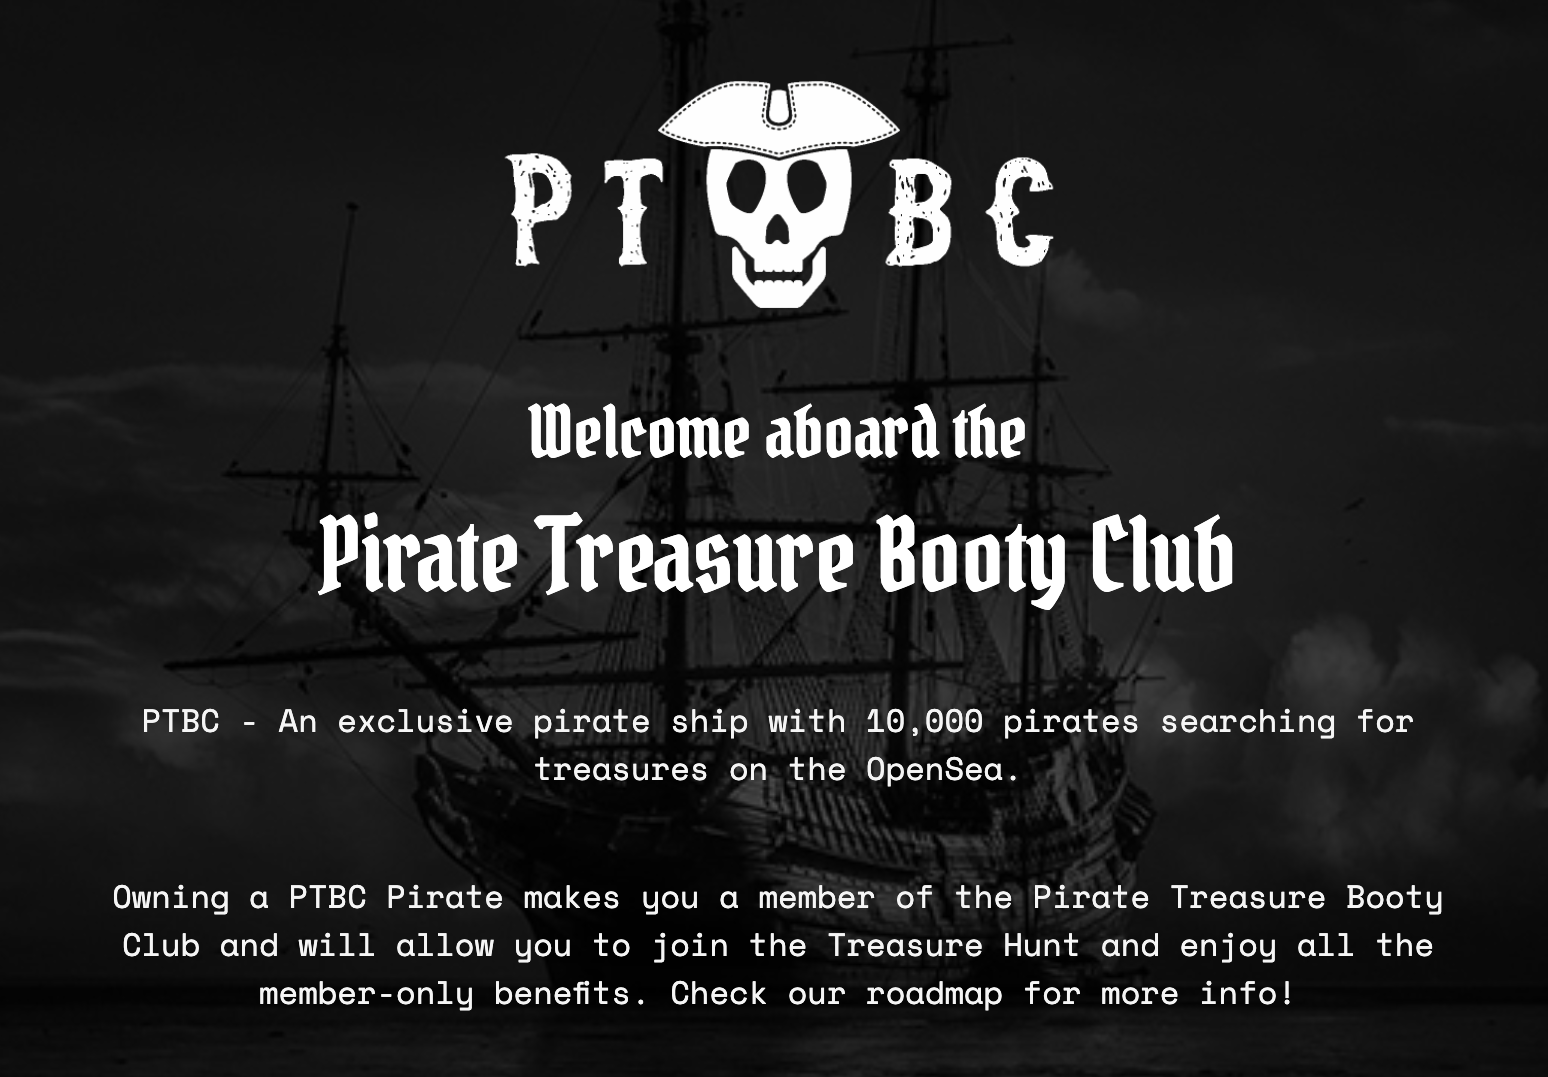 Pirate Treasure Booty Club